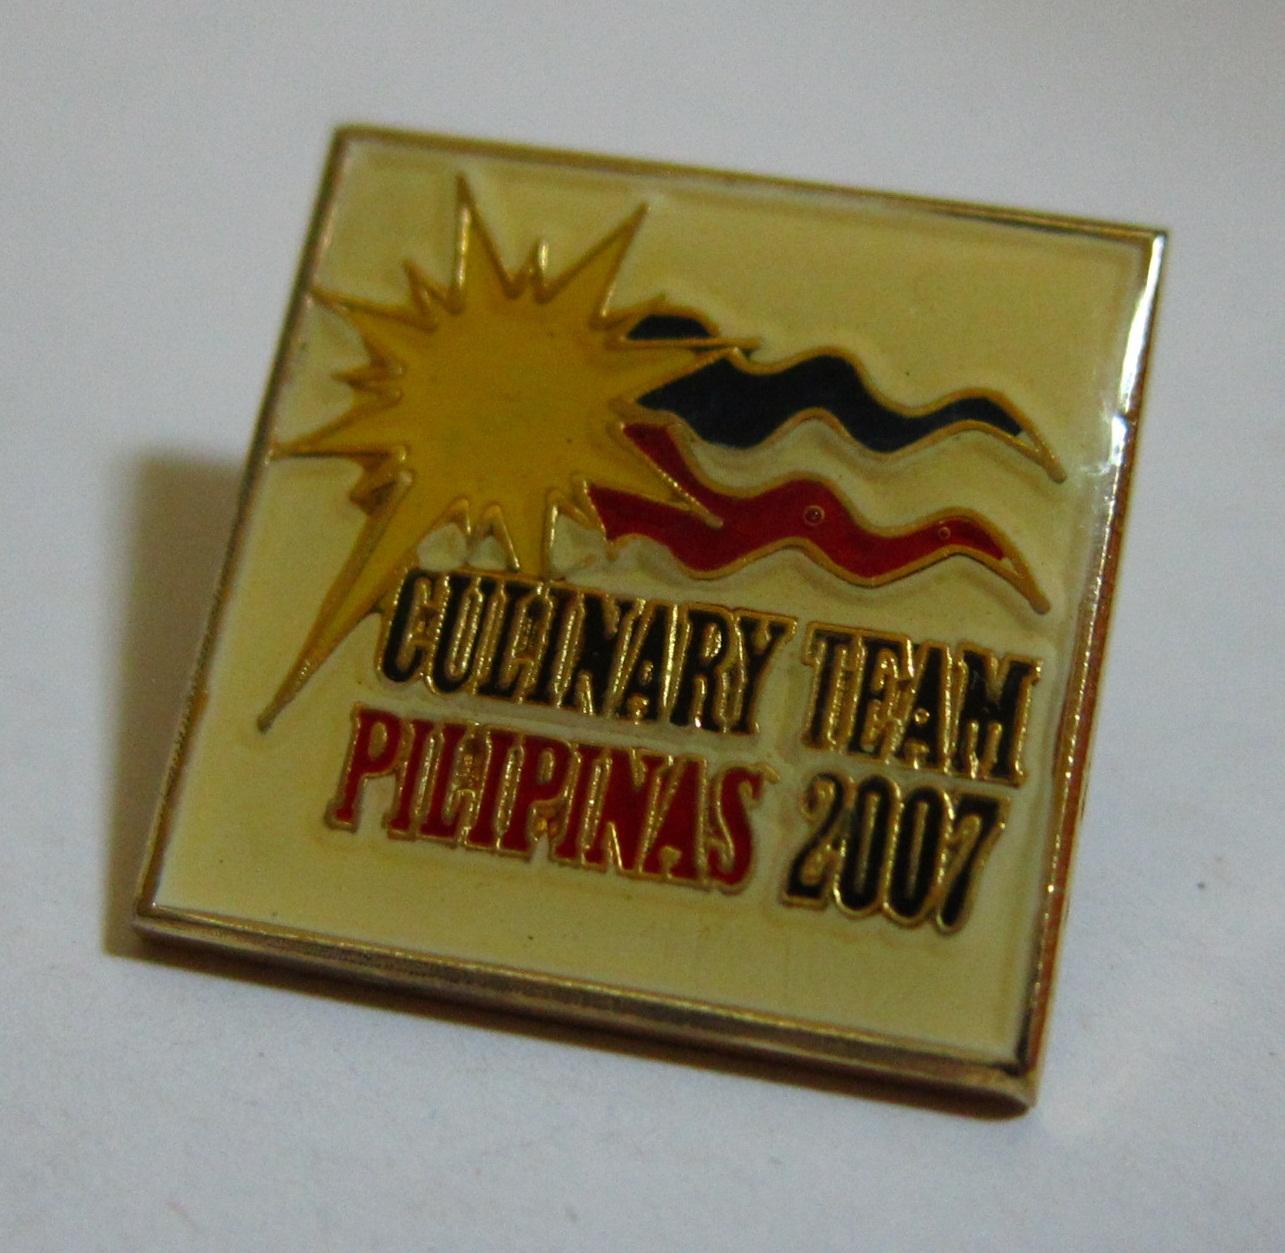 Culinary Team Pilipinas 2007 Reunion